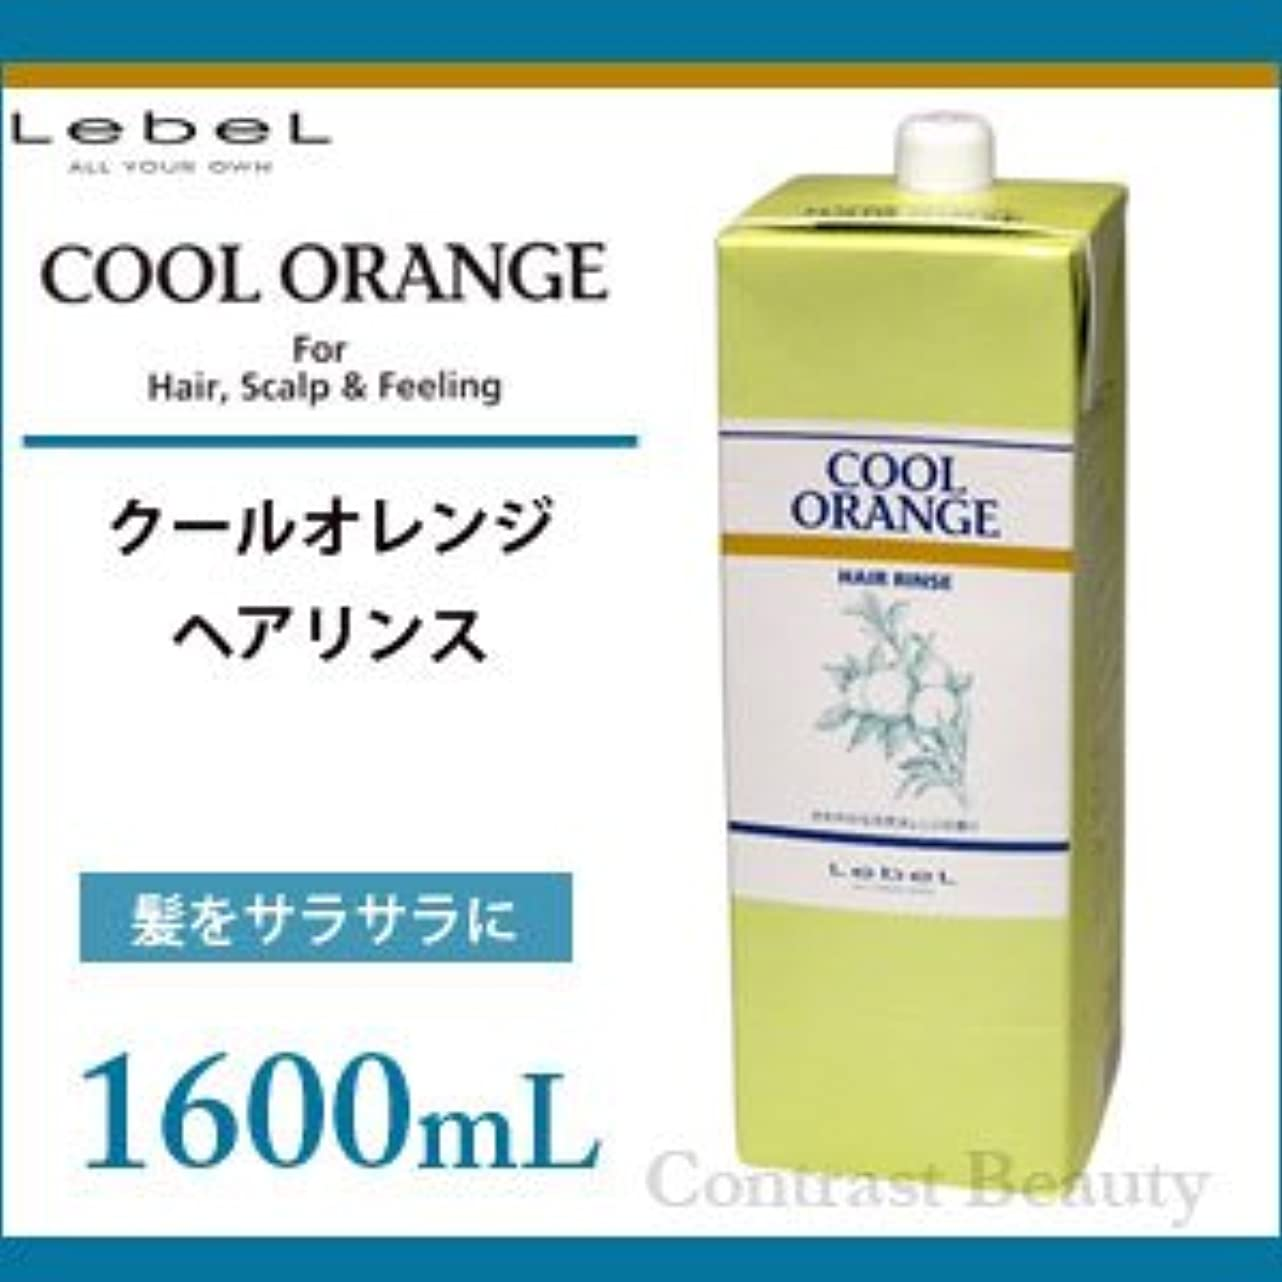 【X2個セット】 ルベル クールオレンジ ヘアリンス 1600ml